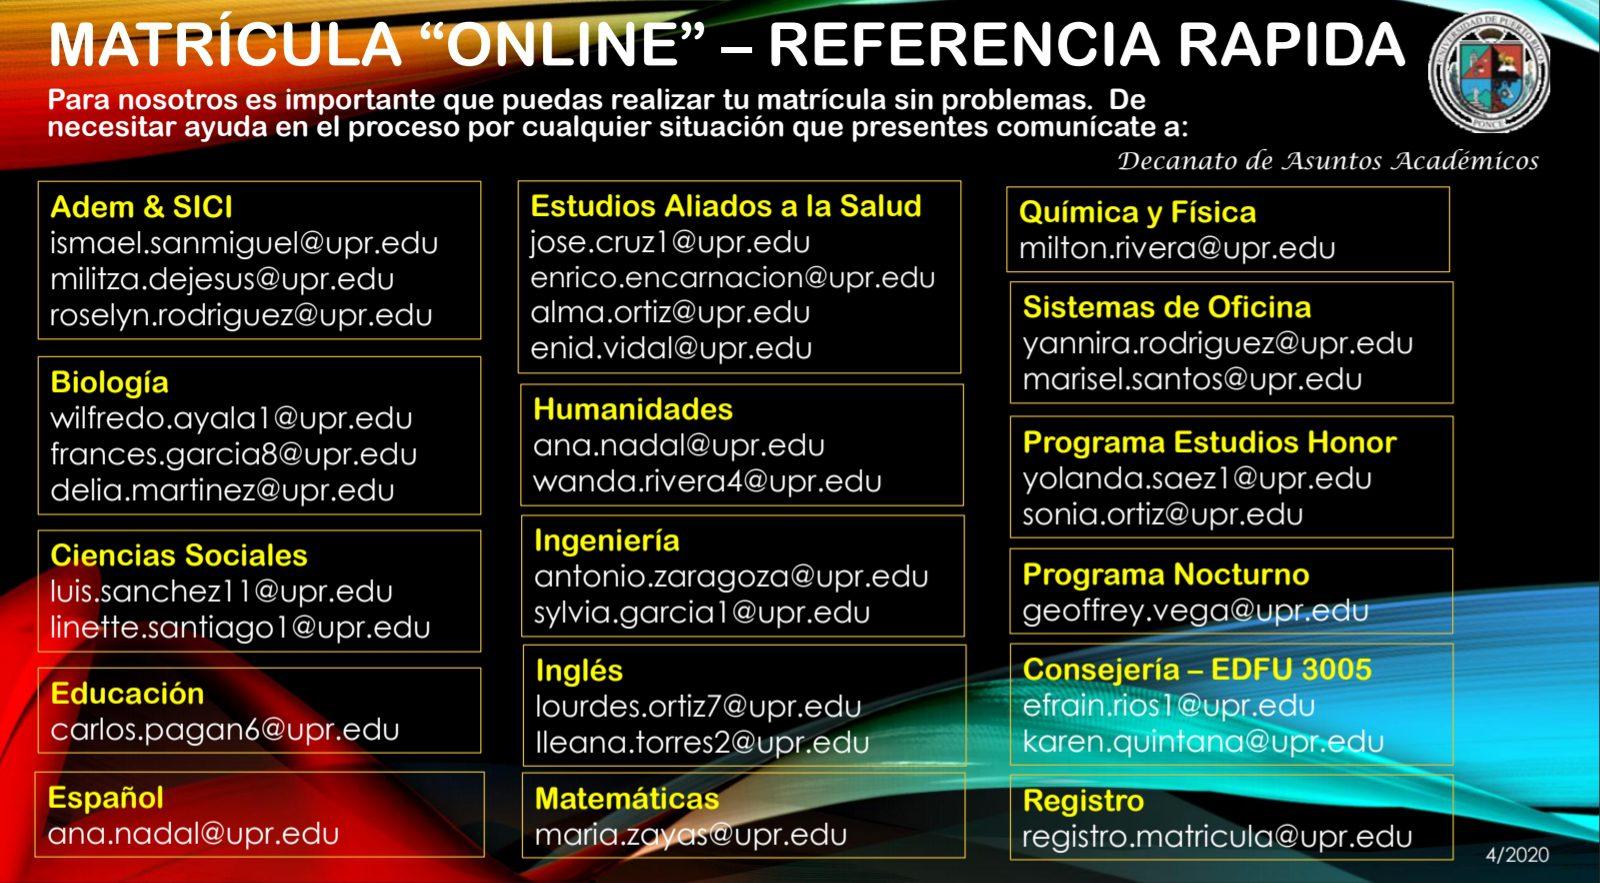 referencia rapida matricula online